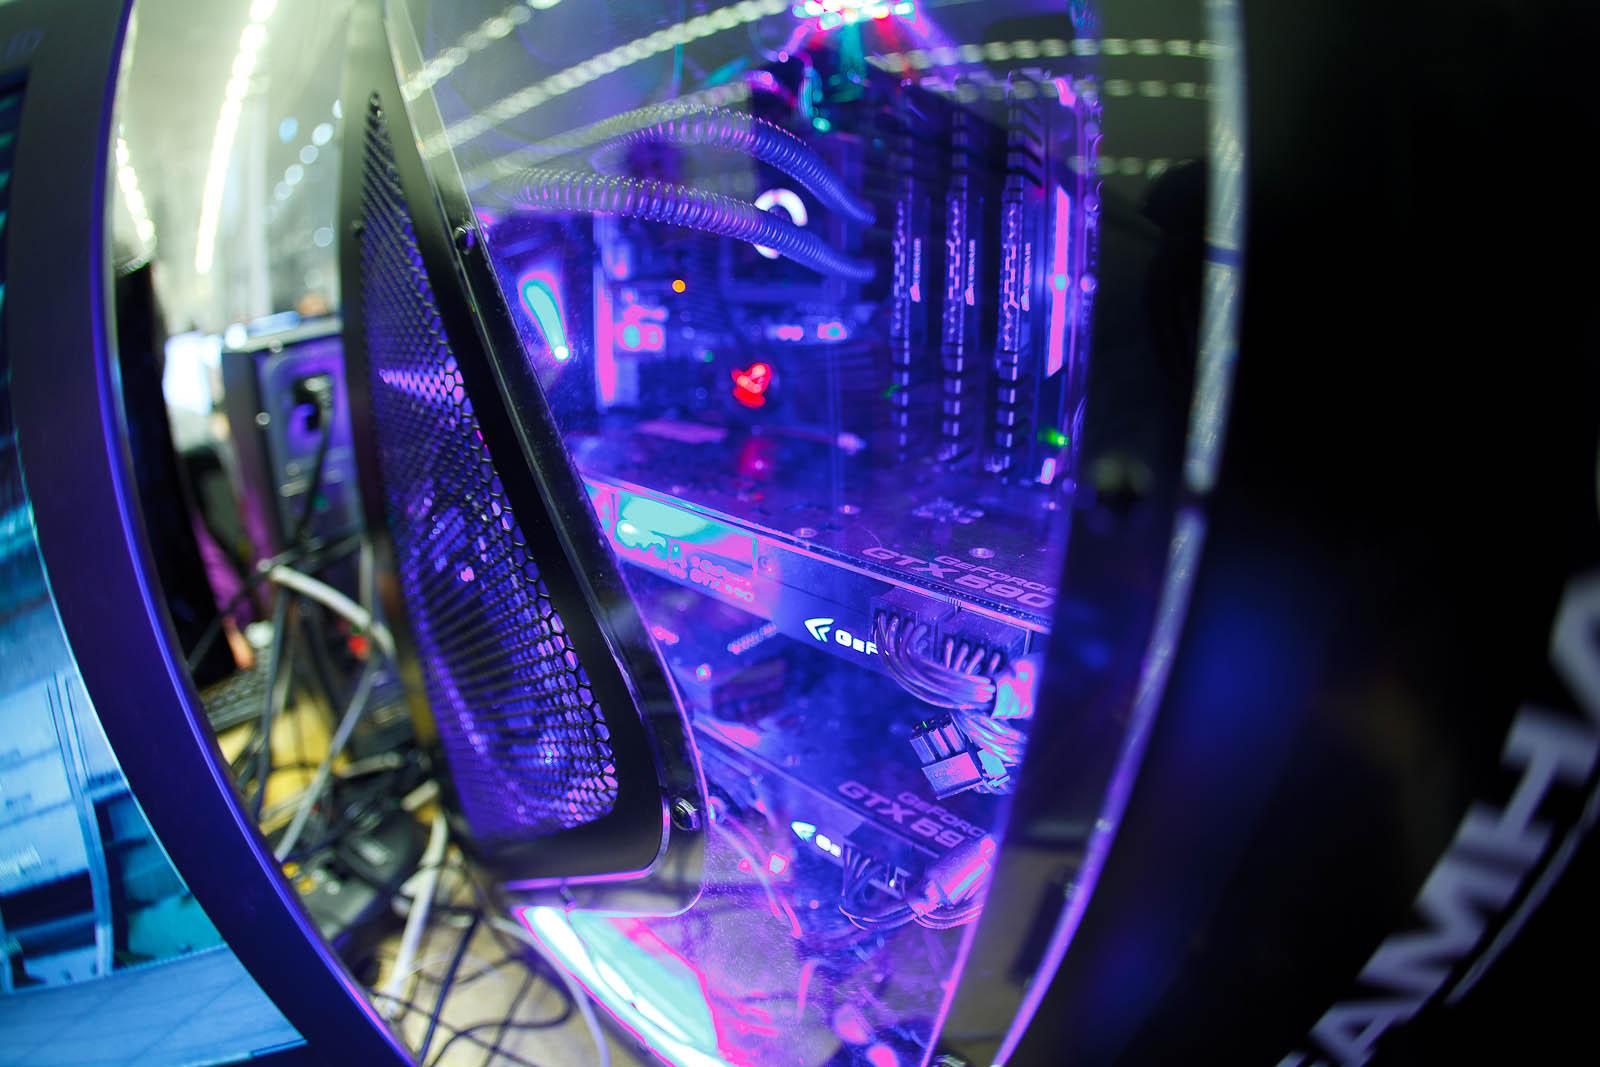 Dual GeForce GTX 590s